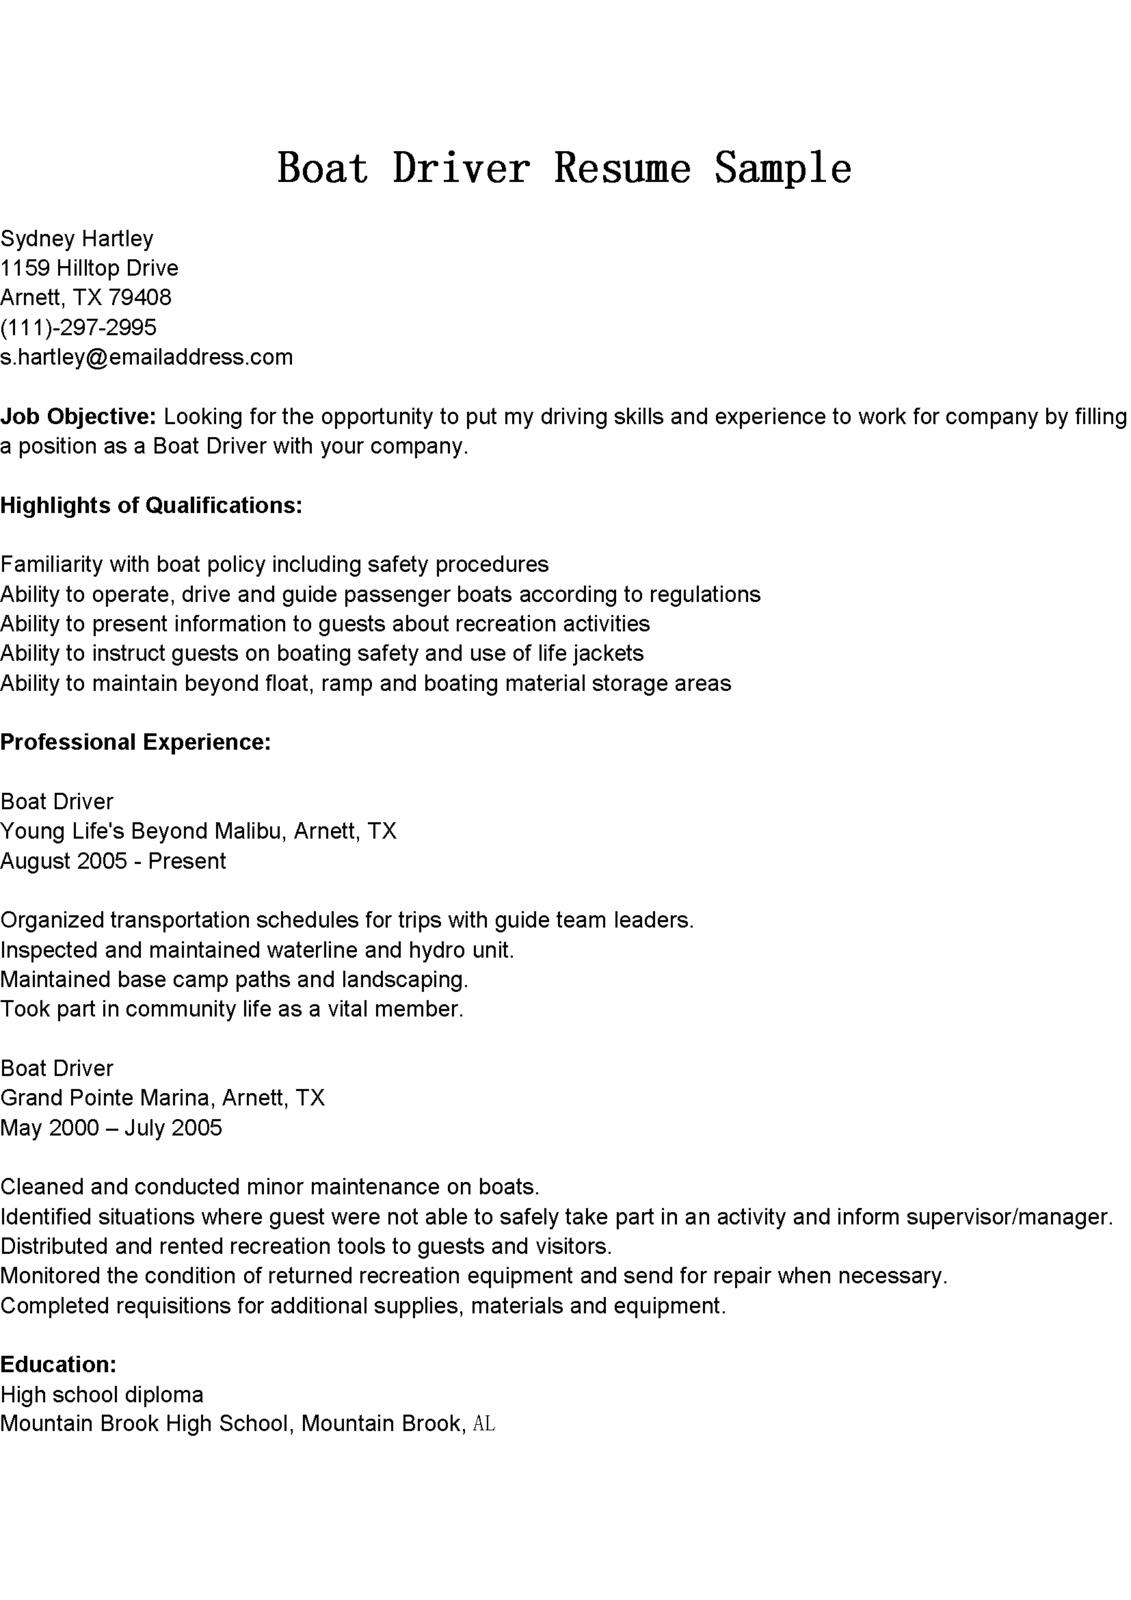 ups resume - Sample Resume For Ups Driver Helper